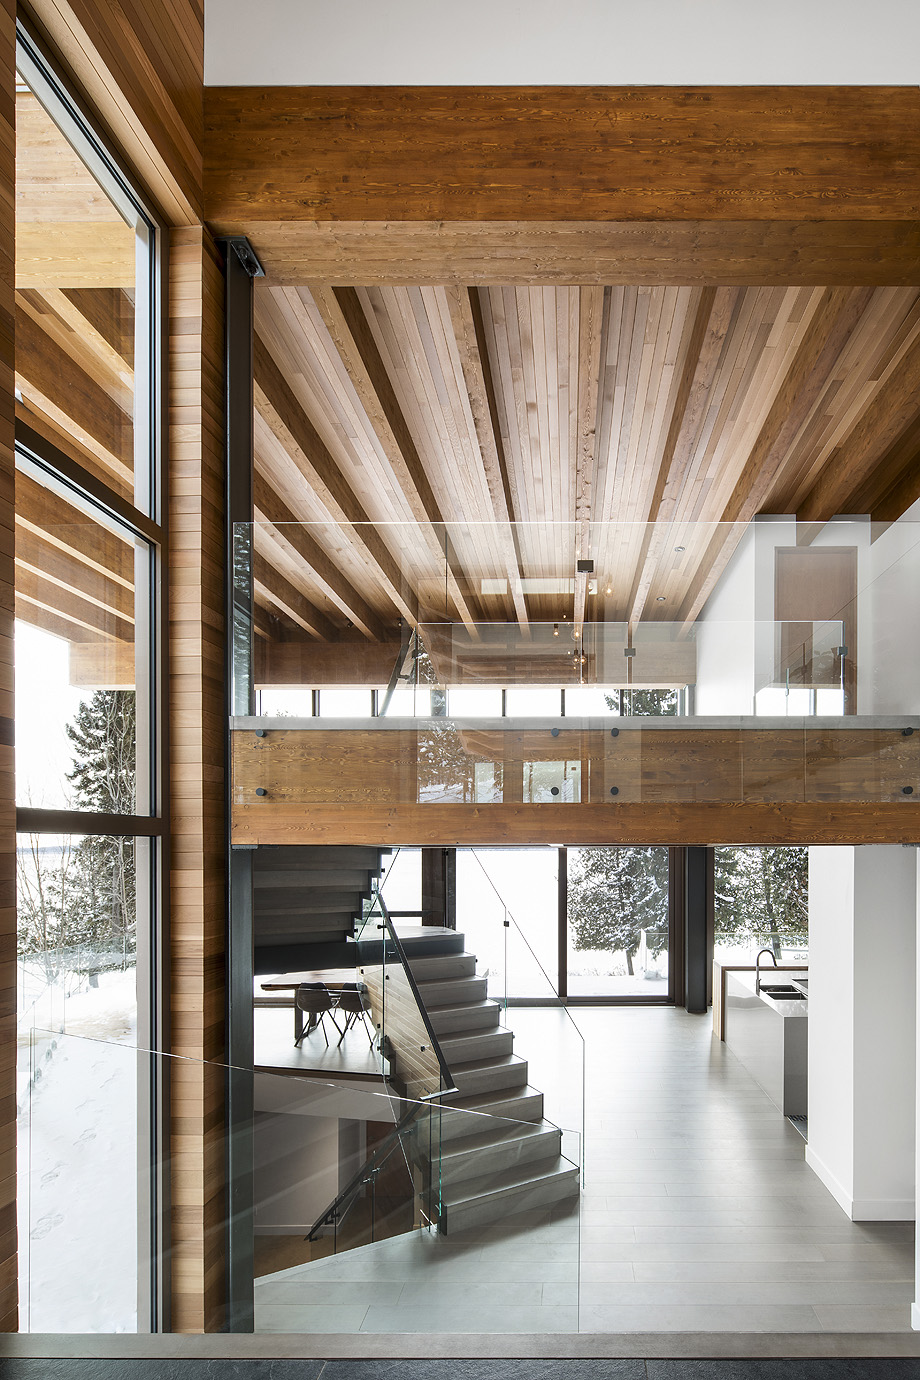 casa accostee de bourgeois lechasseur architects - foto adrien williams (5)